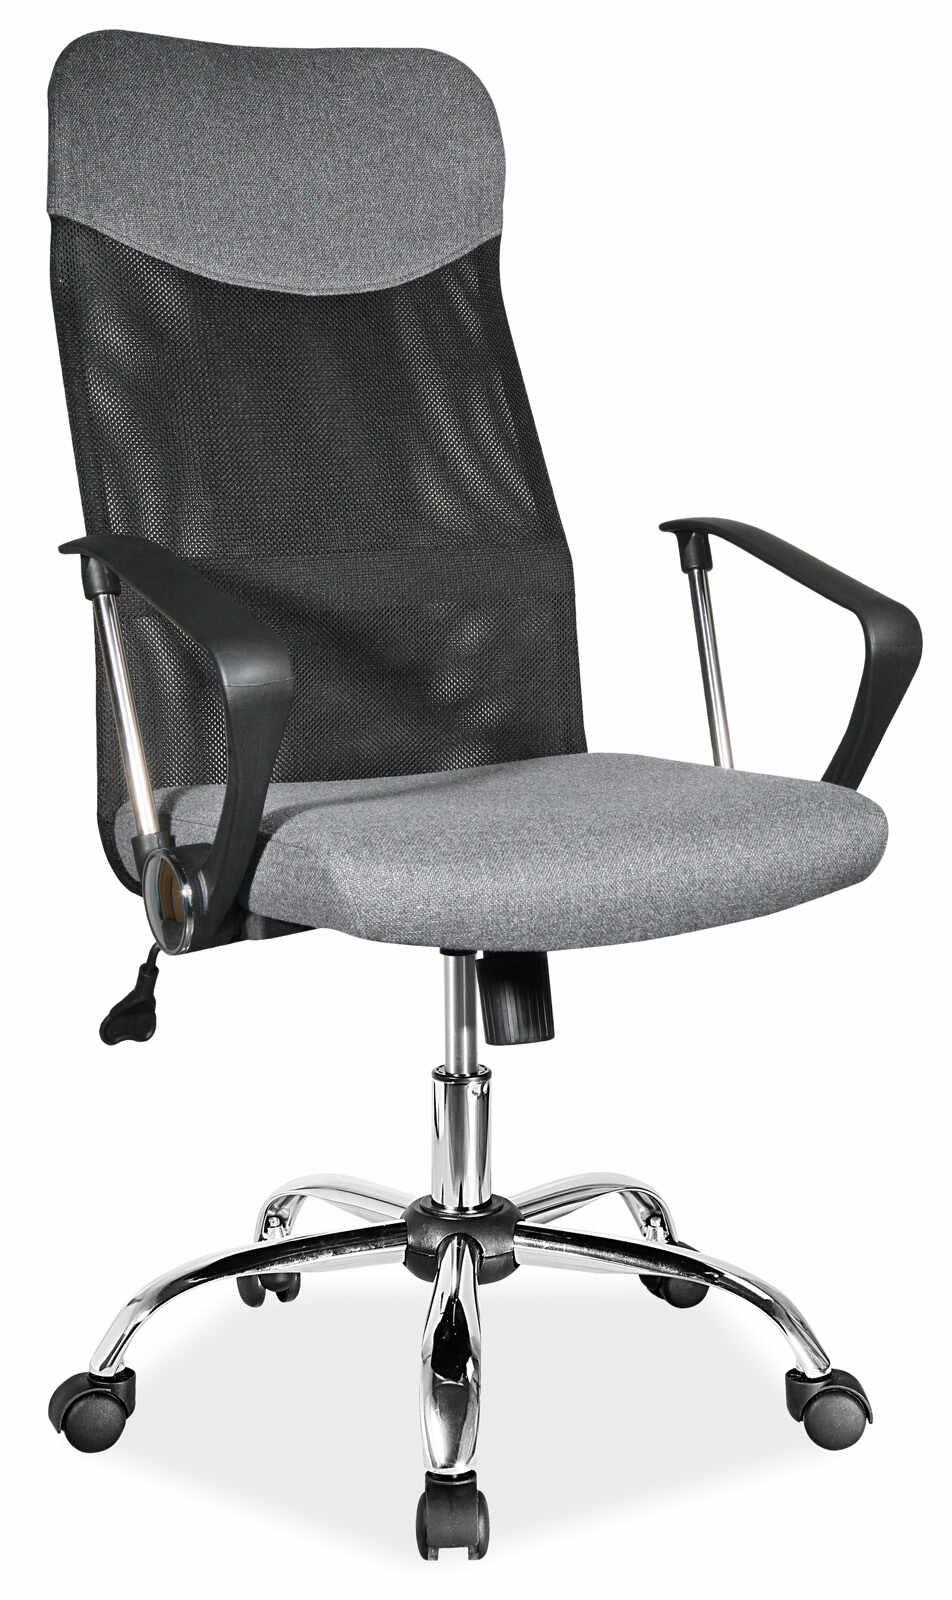 Scaun de birou ergonomic tapitat cu stofa Q-025 Grey, l62xA50xH107-116 cm la pret 426 lei